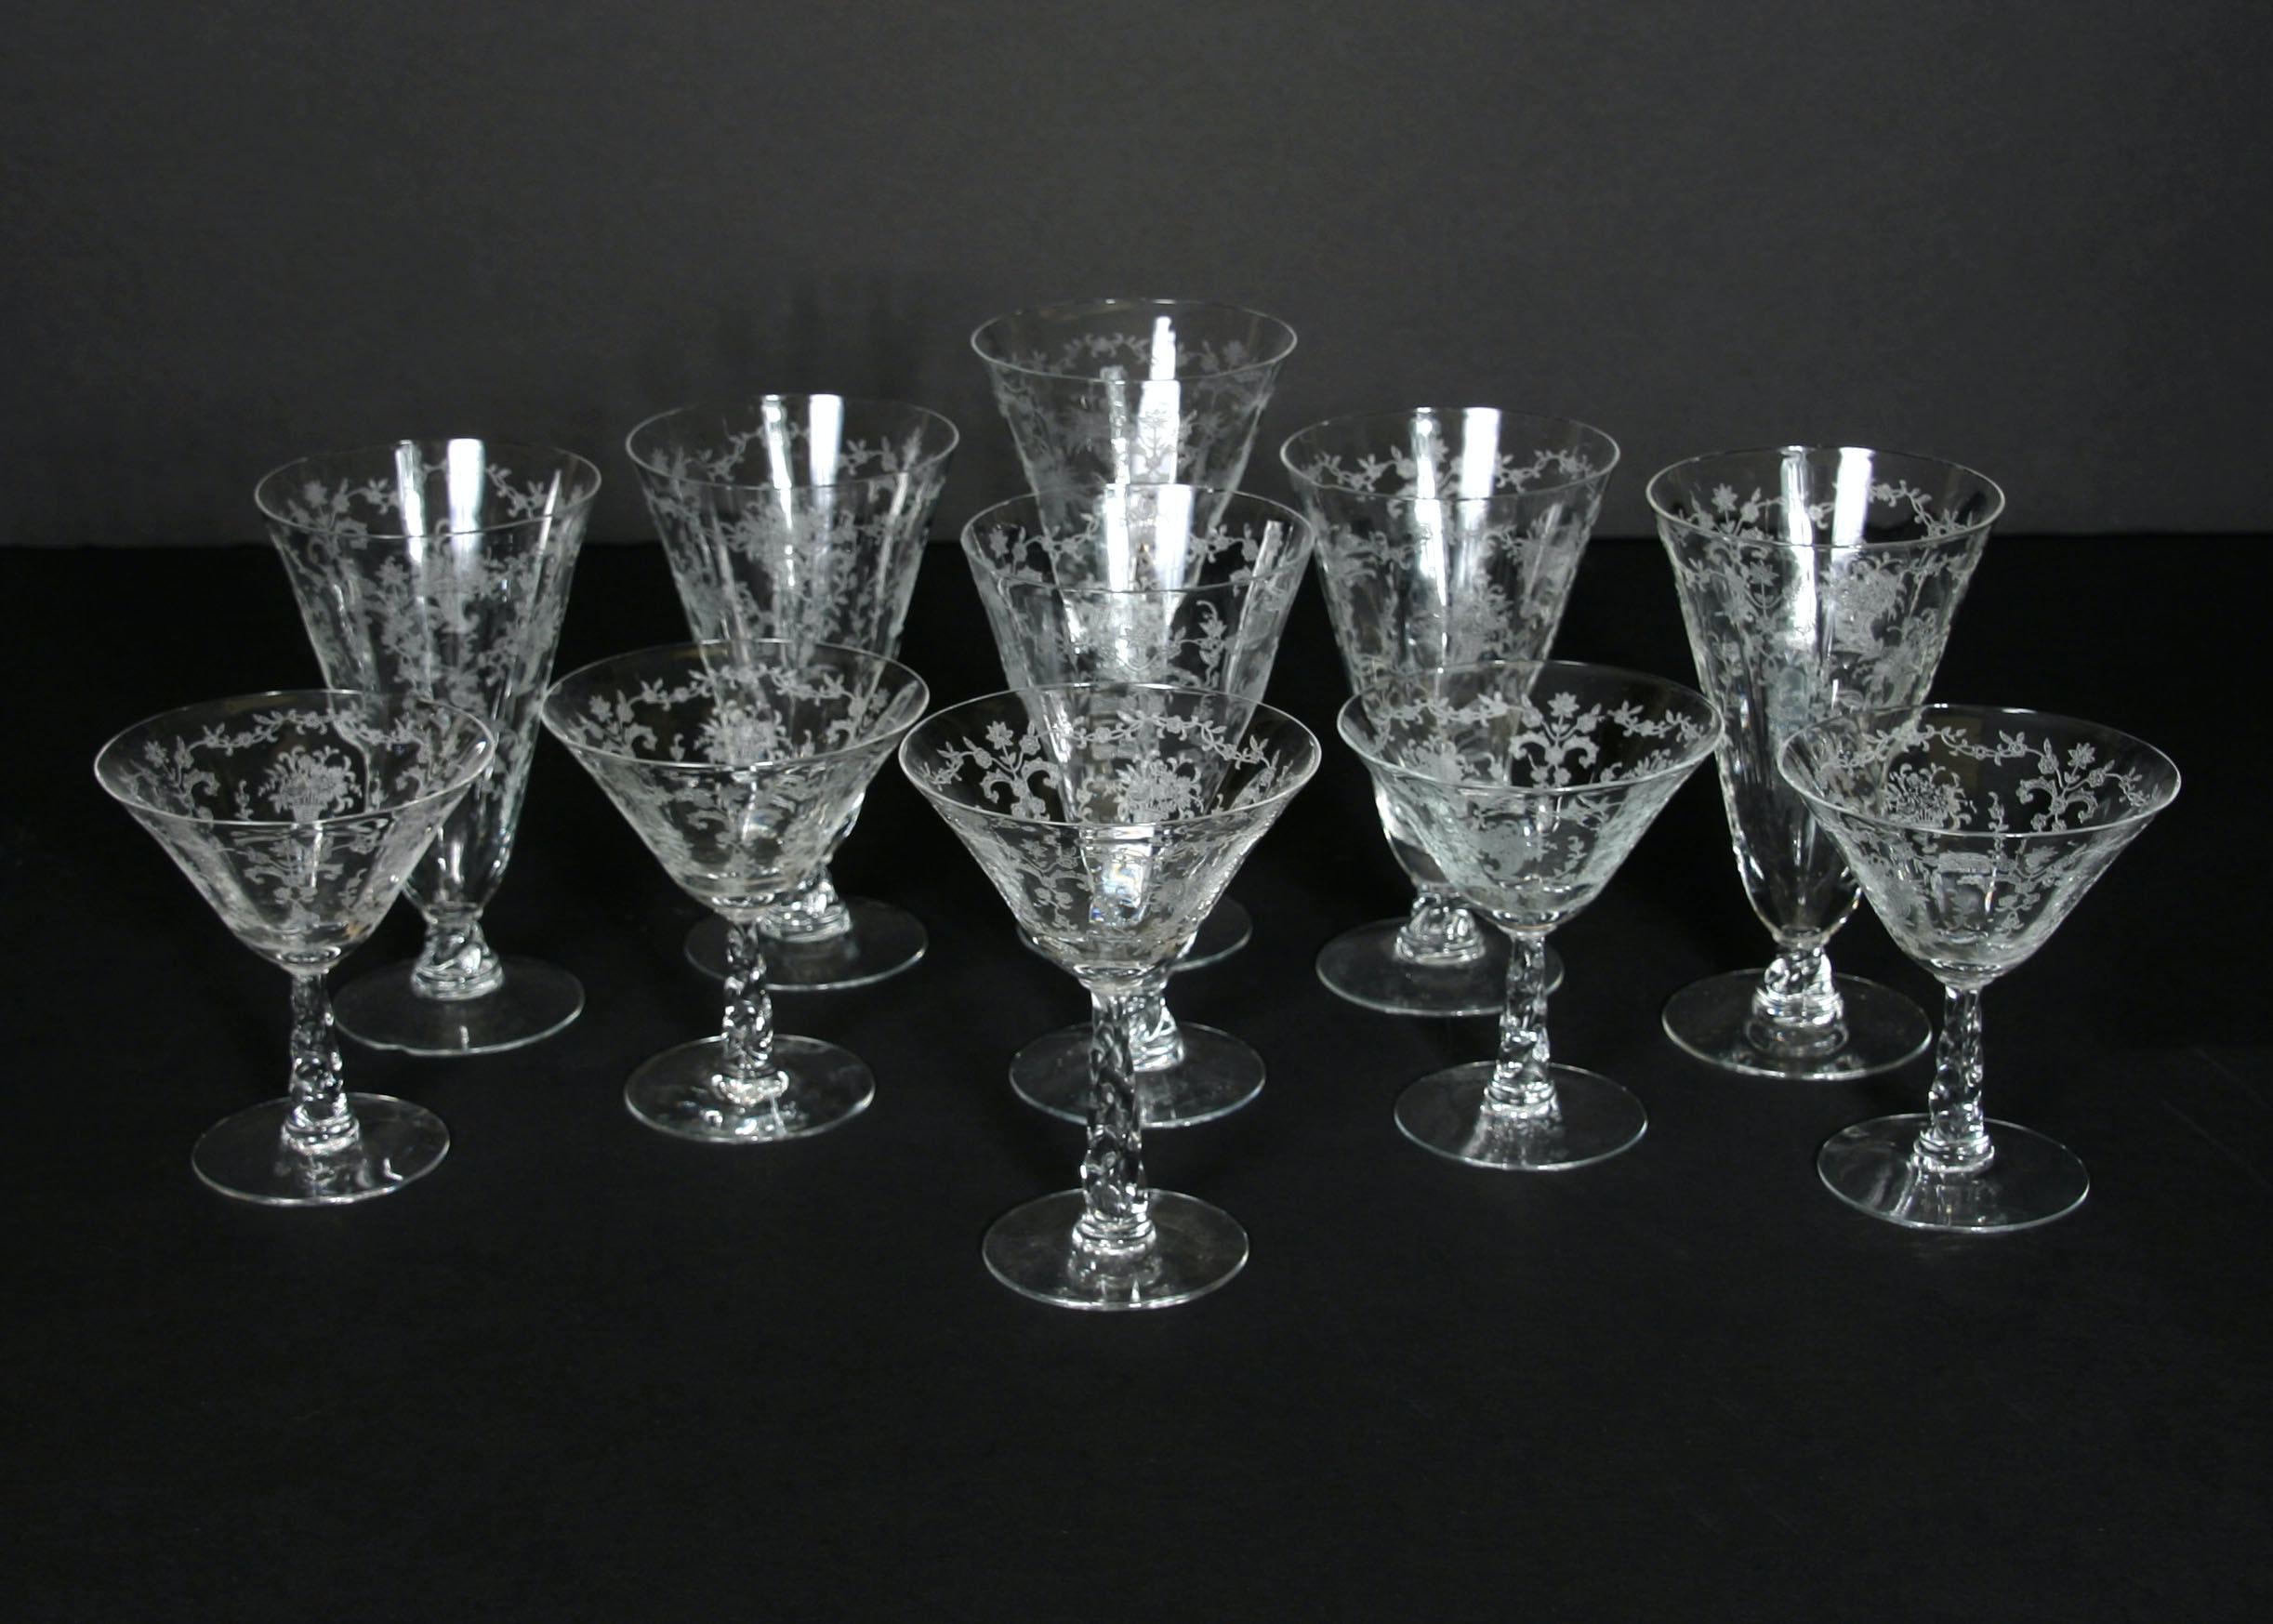 Set of Vintage Fostoria Glassware in Mayflower Pattern